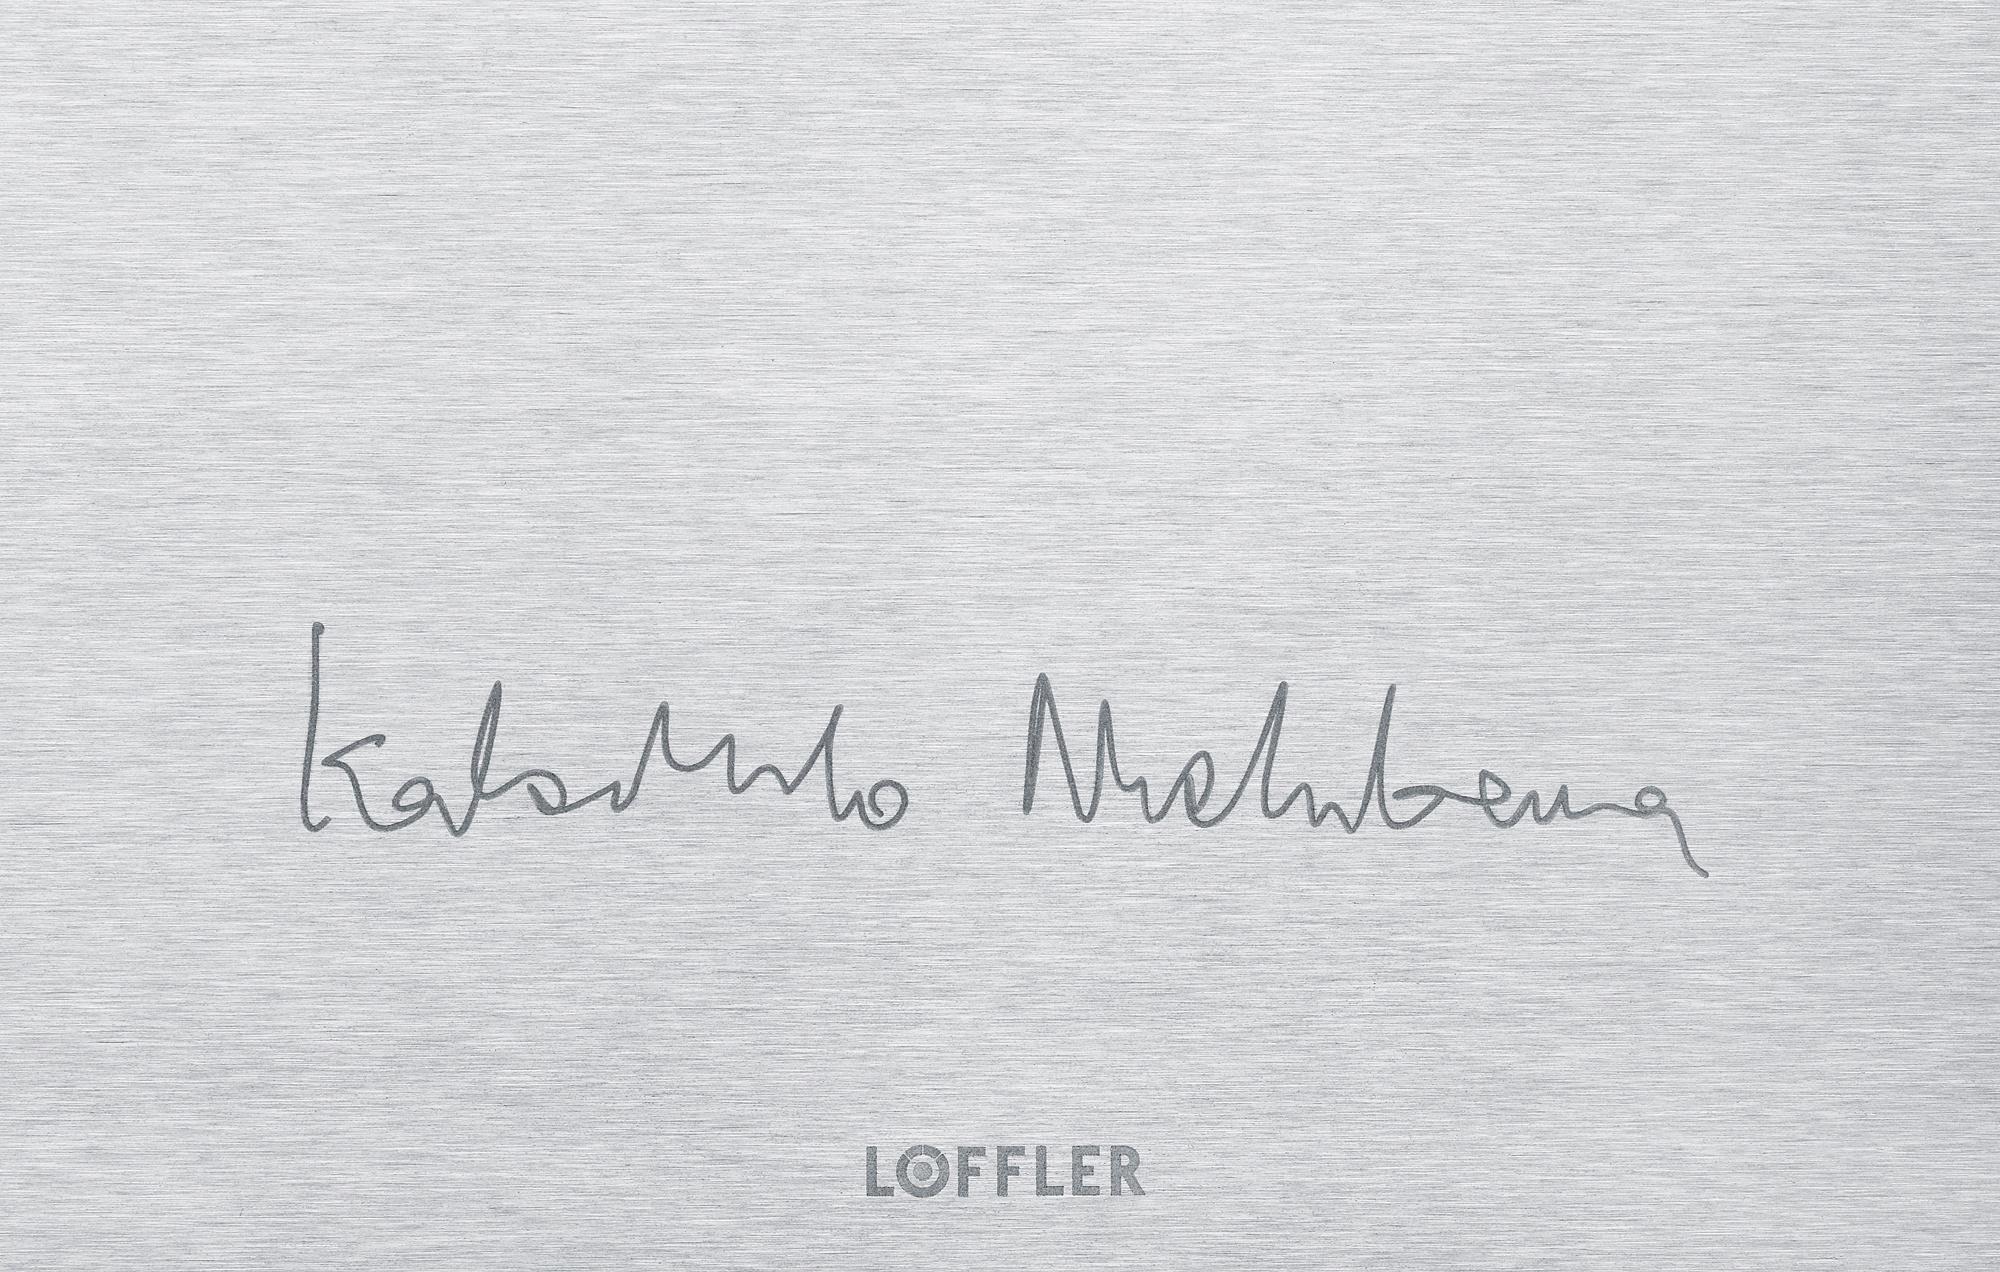 LOFFLER NISHIKAWA